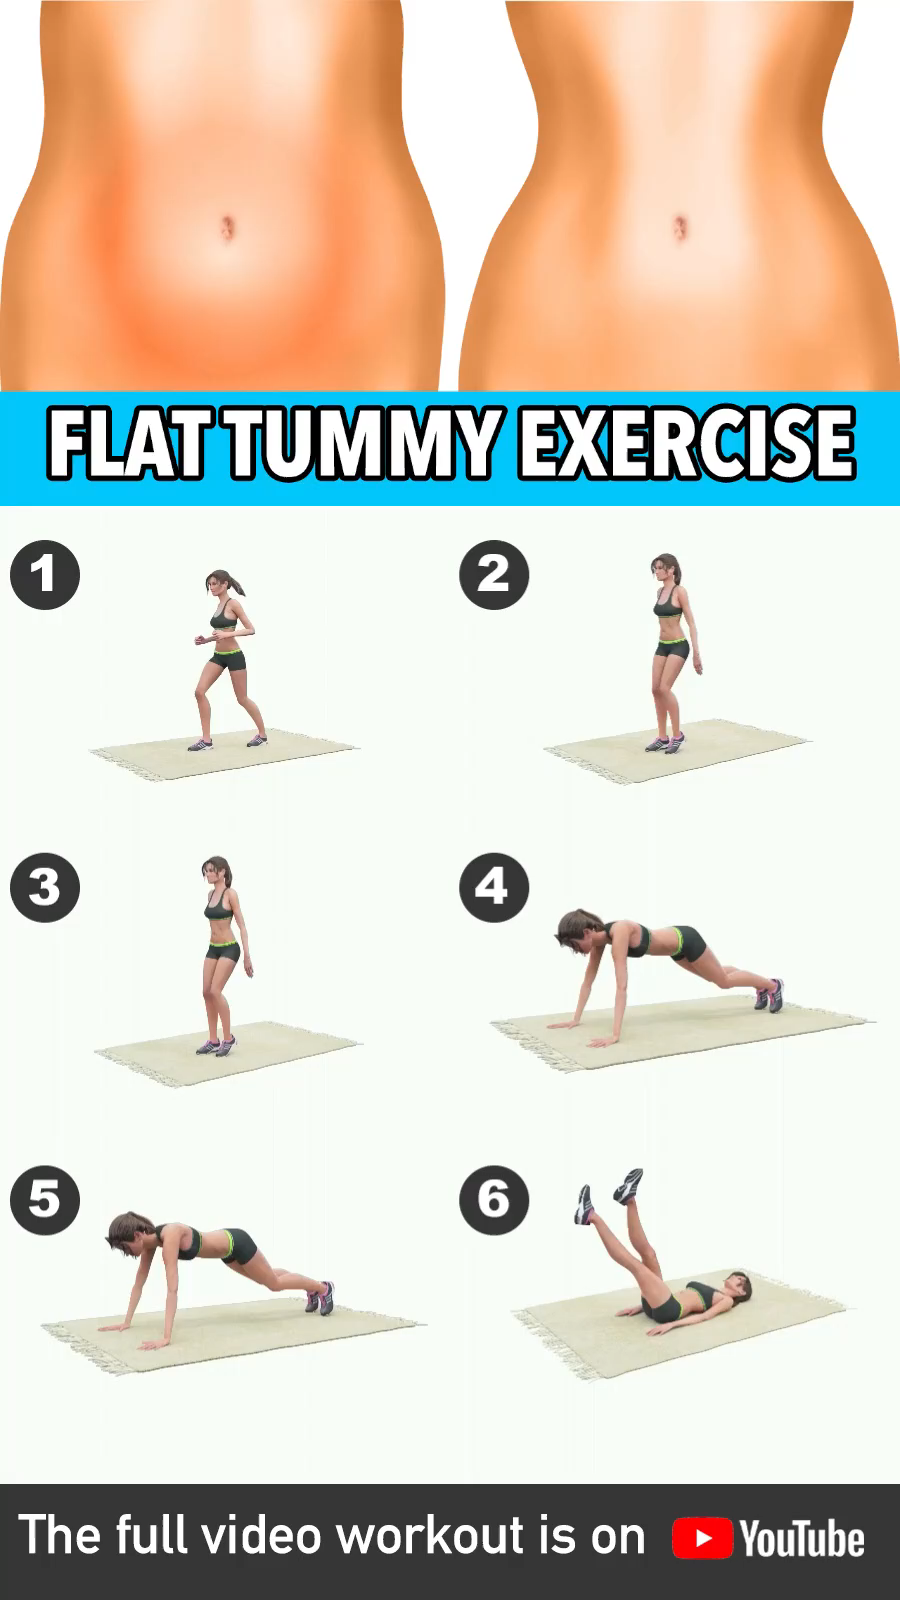 #Flat #Tummy -  #Flat #Tummy  - #fitness #flat #GymHumor #Pilates #tummy #Yoga